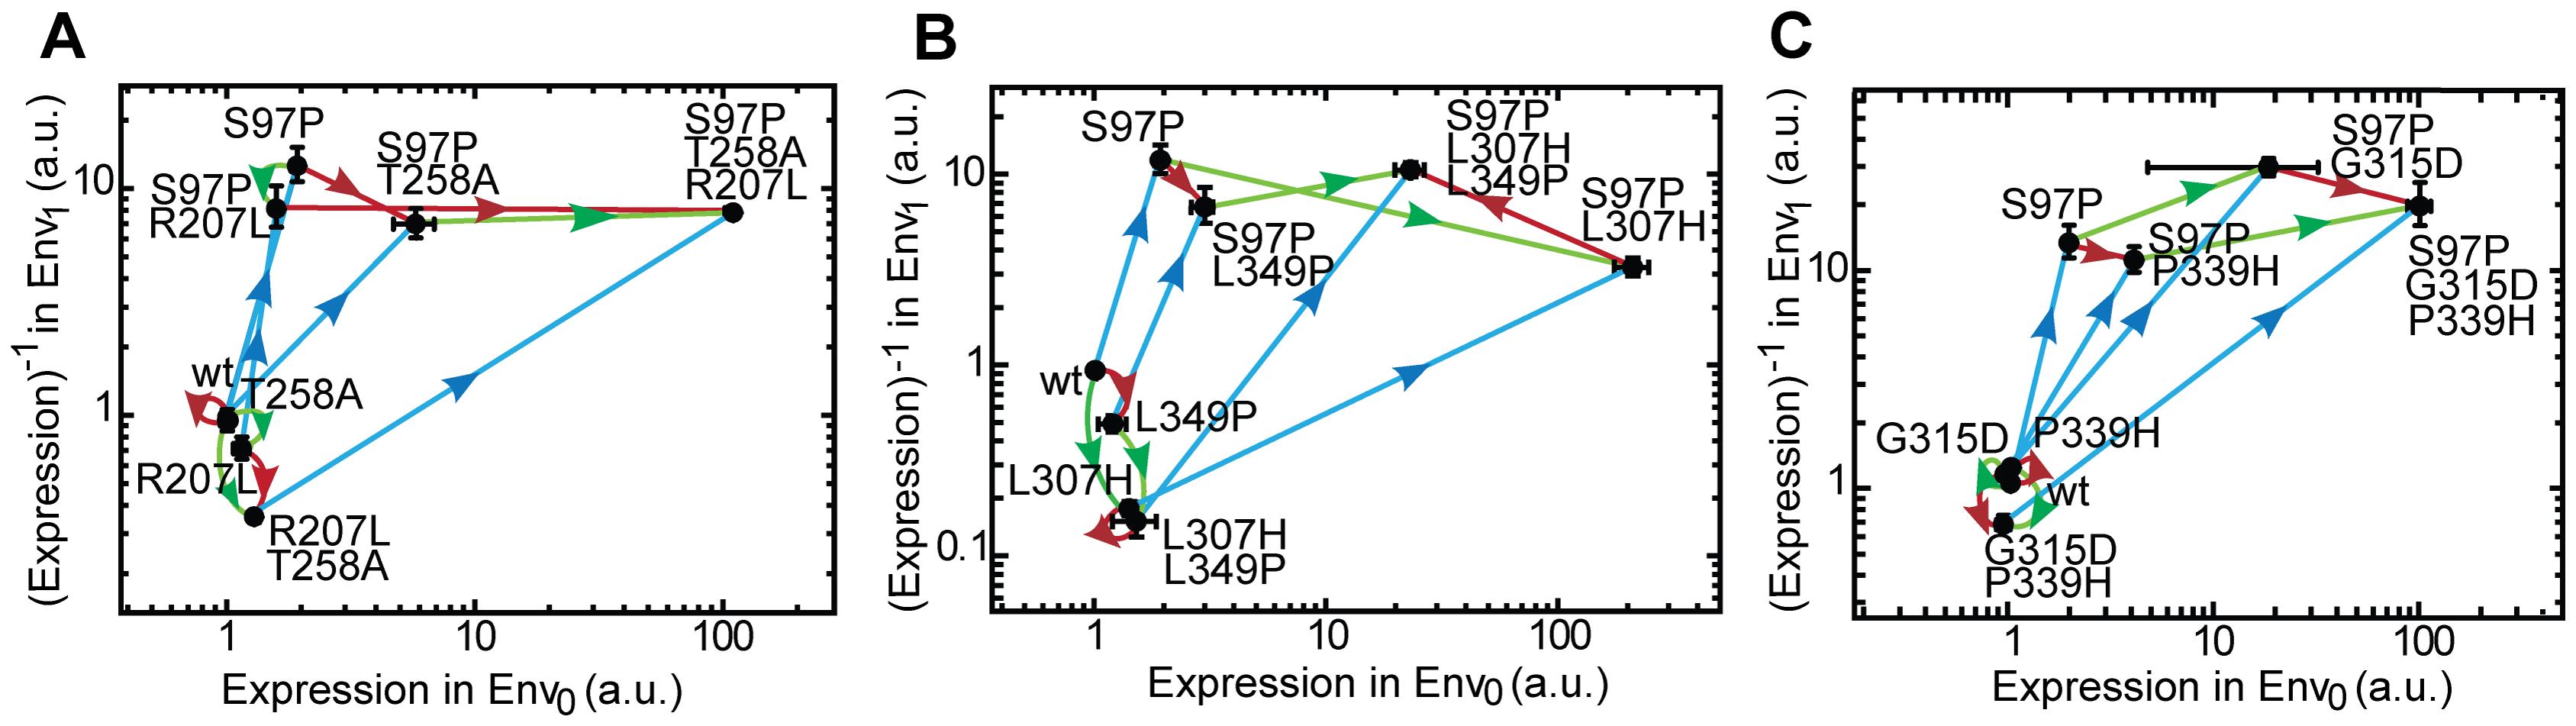 Adaptive trajectories towards the three inverse LacI variants.